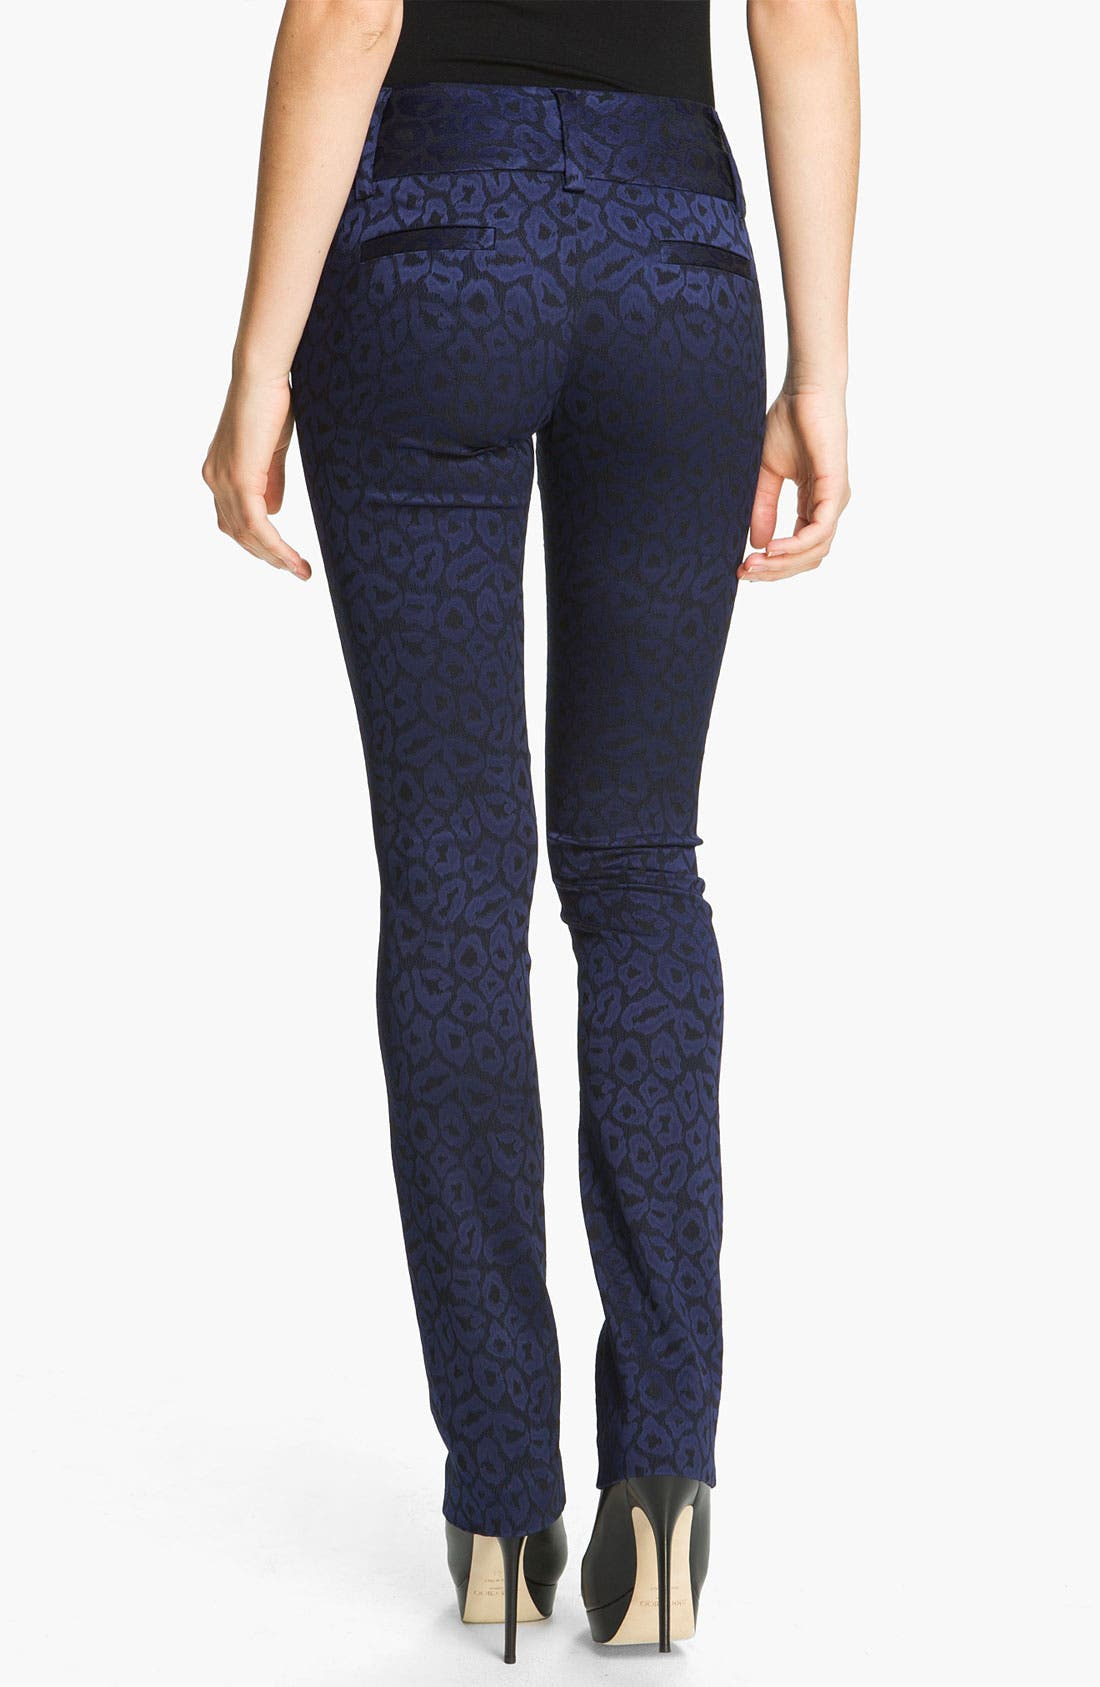 Alternate Image 1 Selected - Alice + Olivia 'Andrew' Leopard Print Skinny Pants